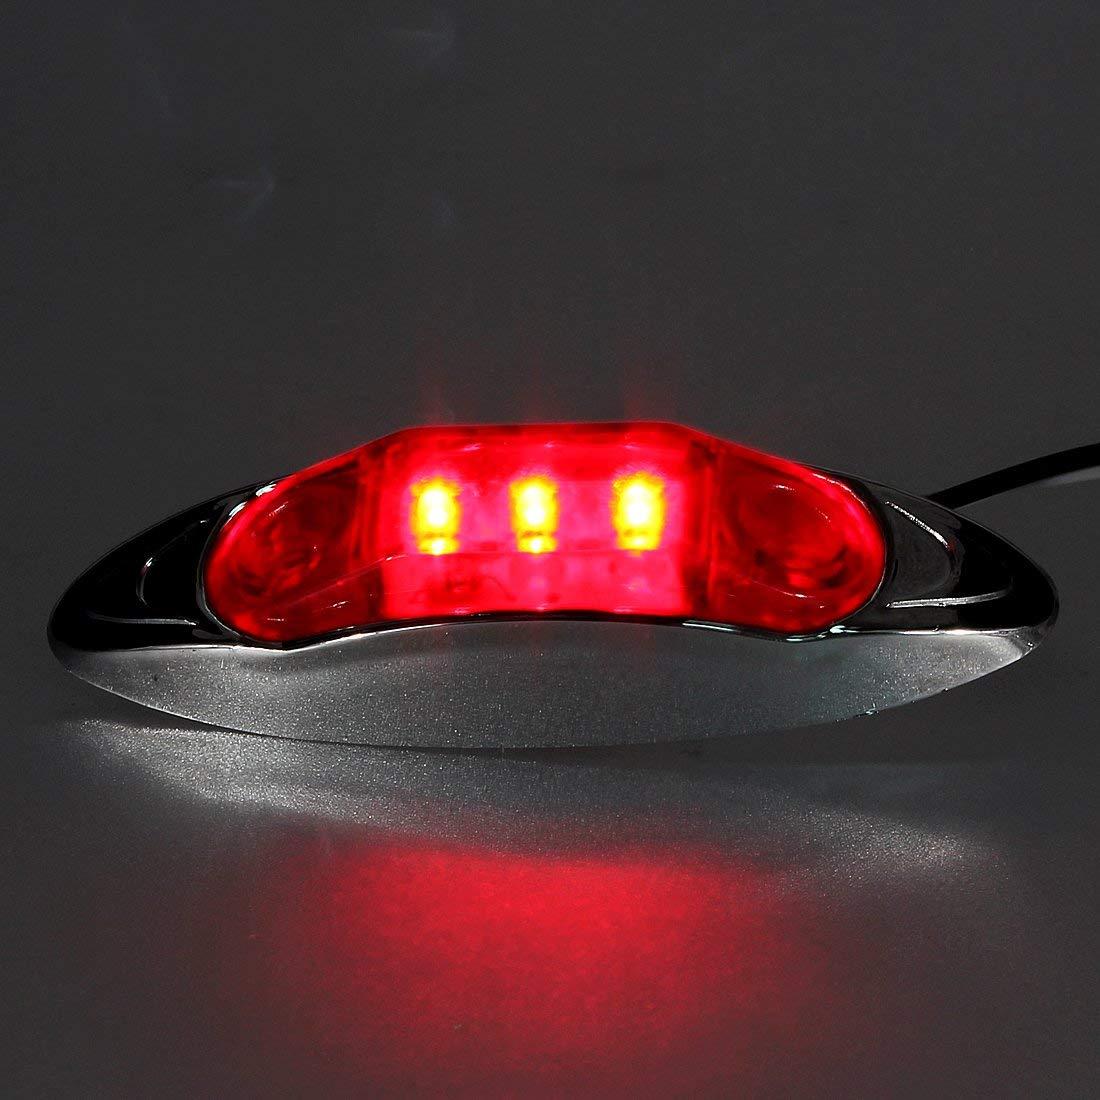 Fincos Waterproof 12V LED Side Marker/Clearance Light for Truck/Trailer